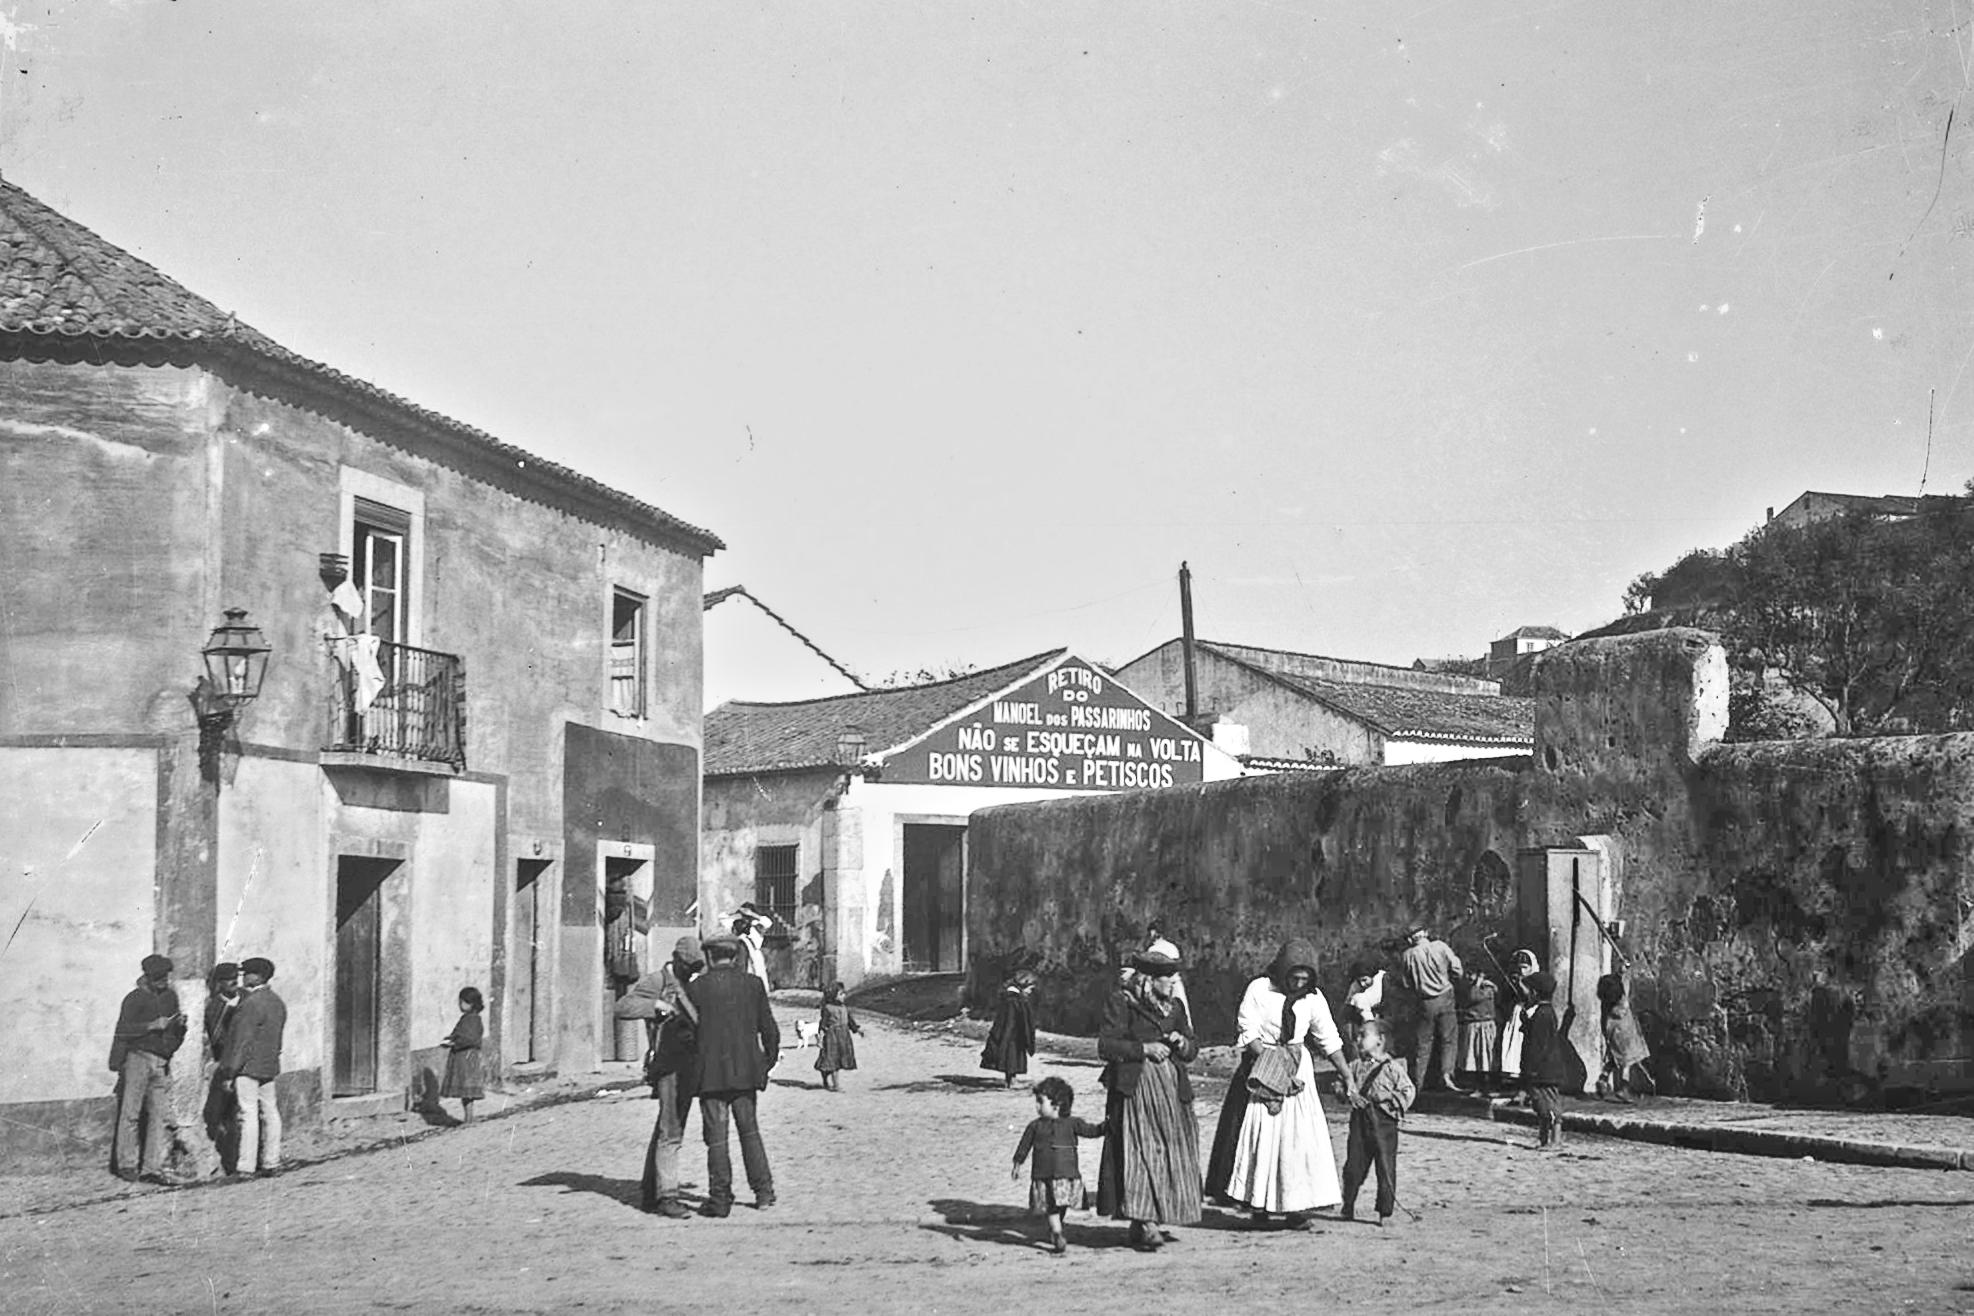 Manuel dos Passarinhos, Lisboa (J.Benoliel, c. 1900)